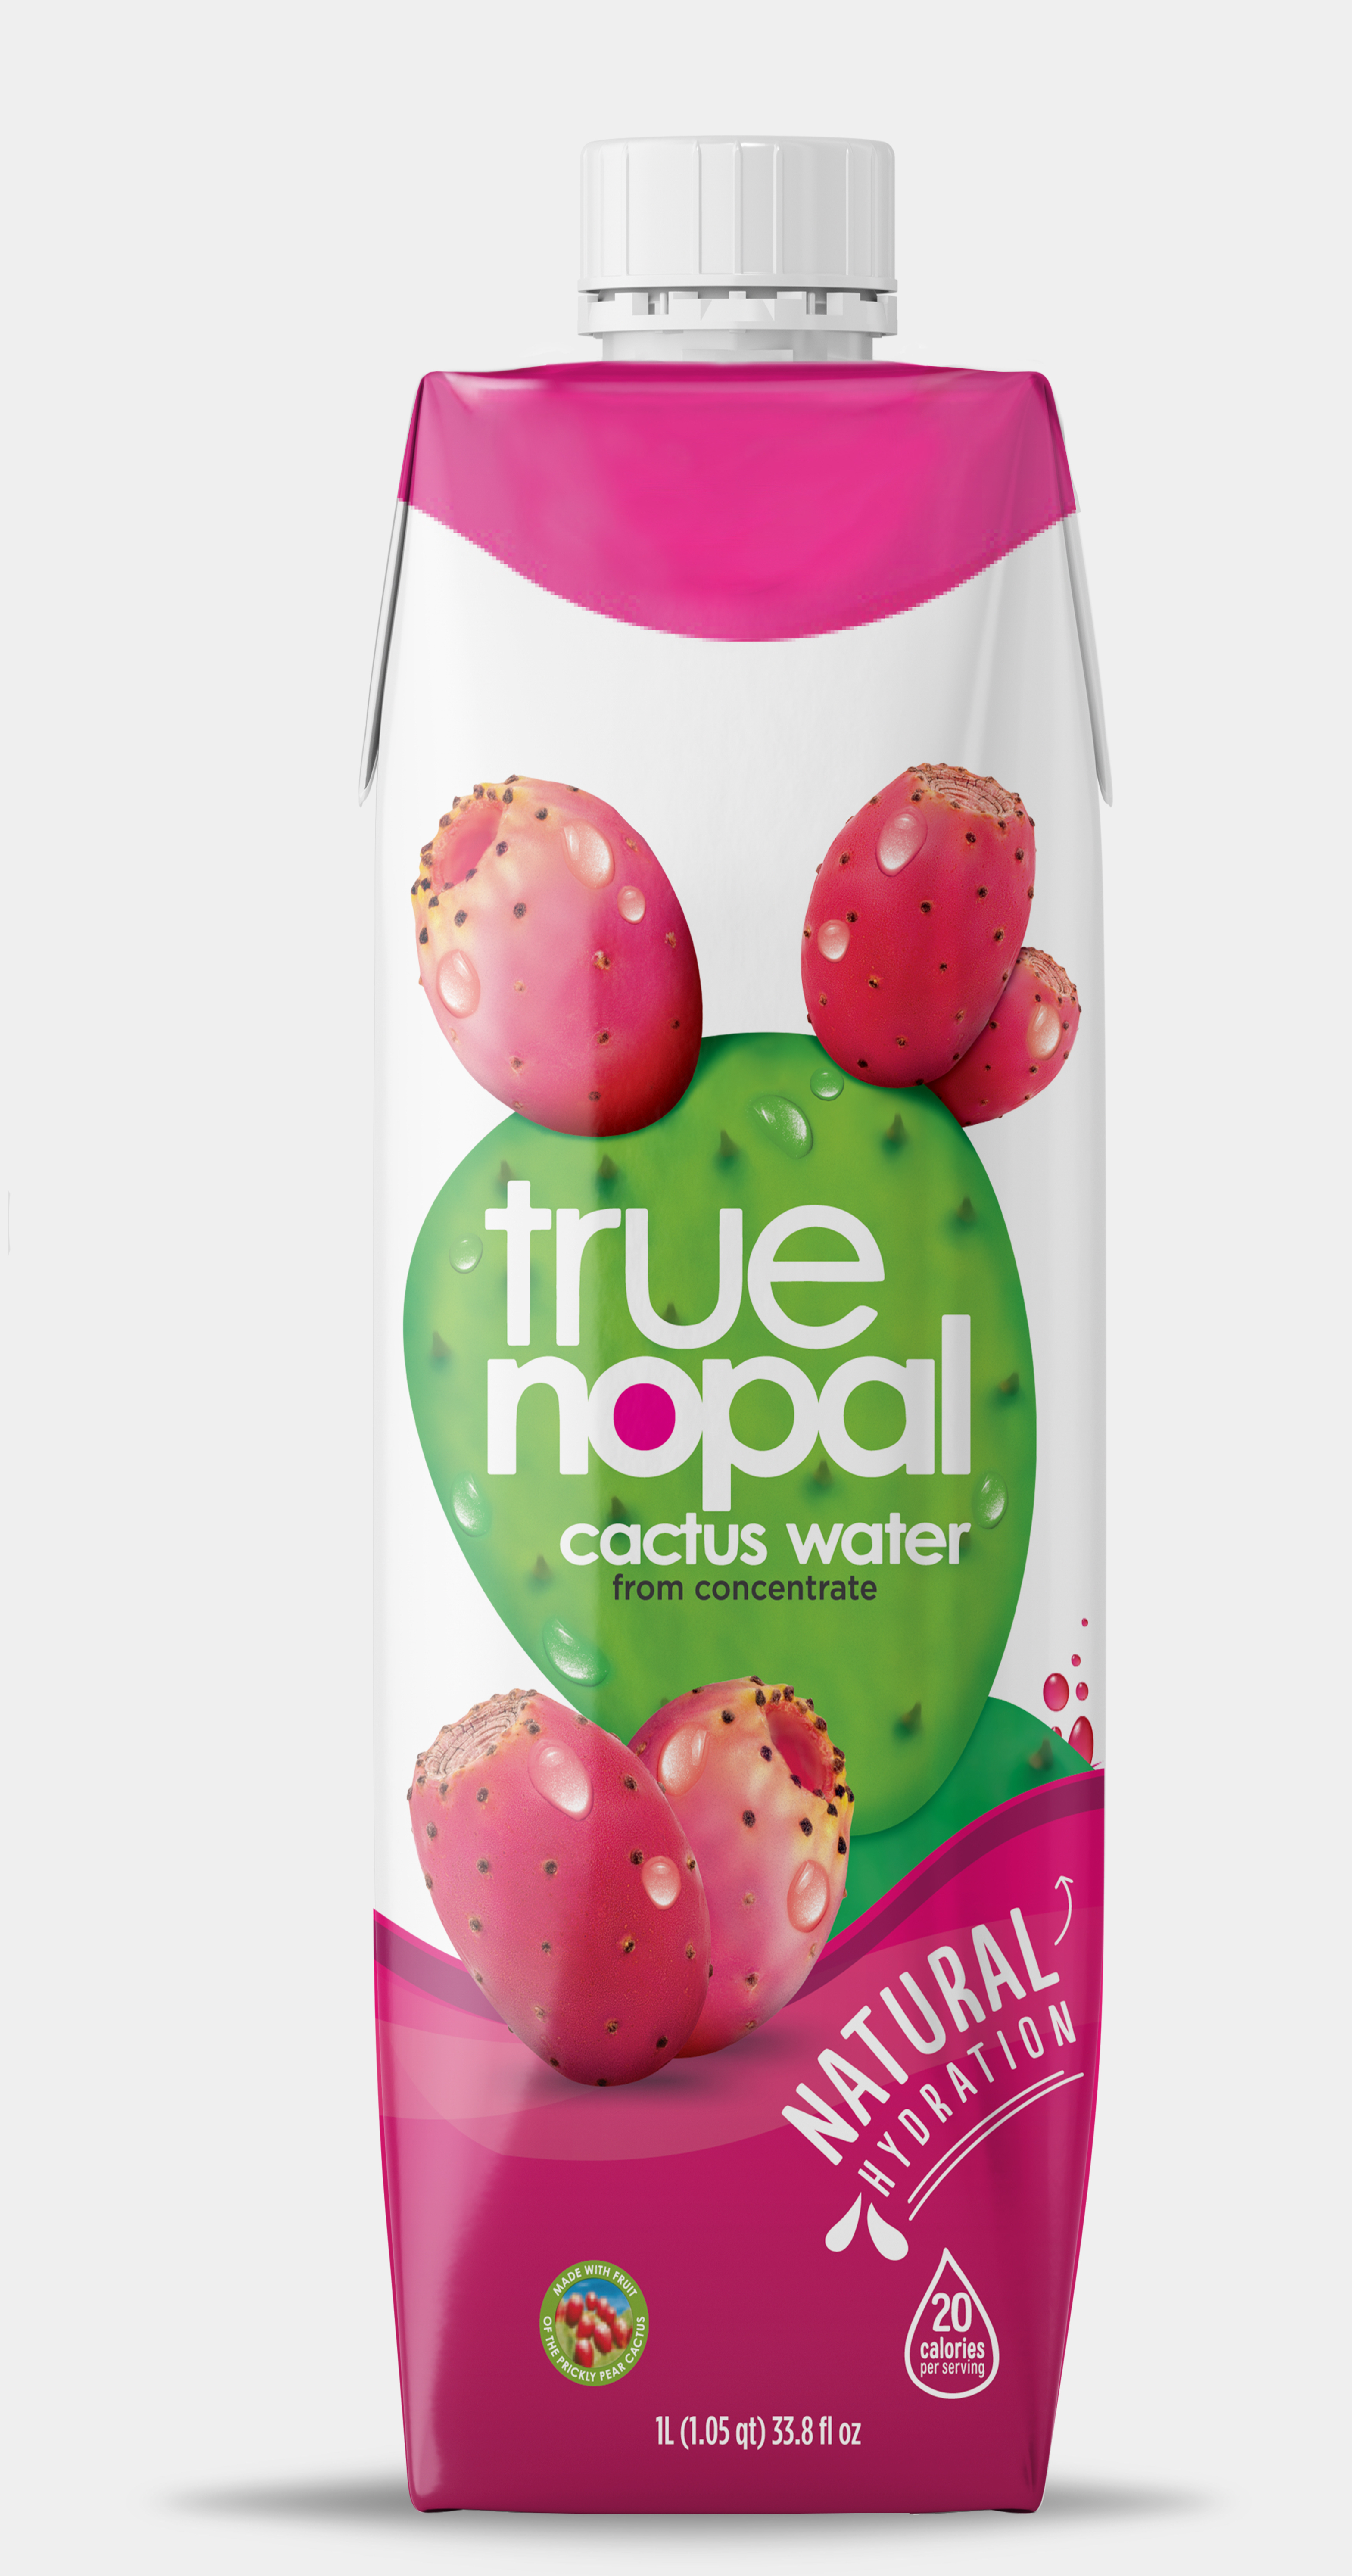 True Nopal Cactus Water 1 liter